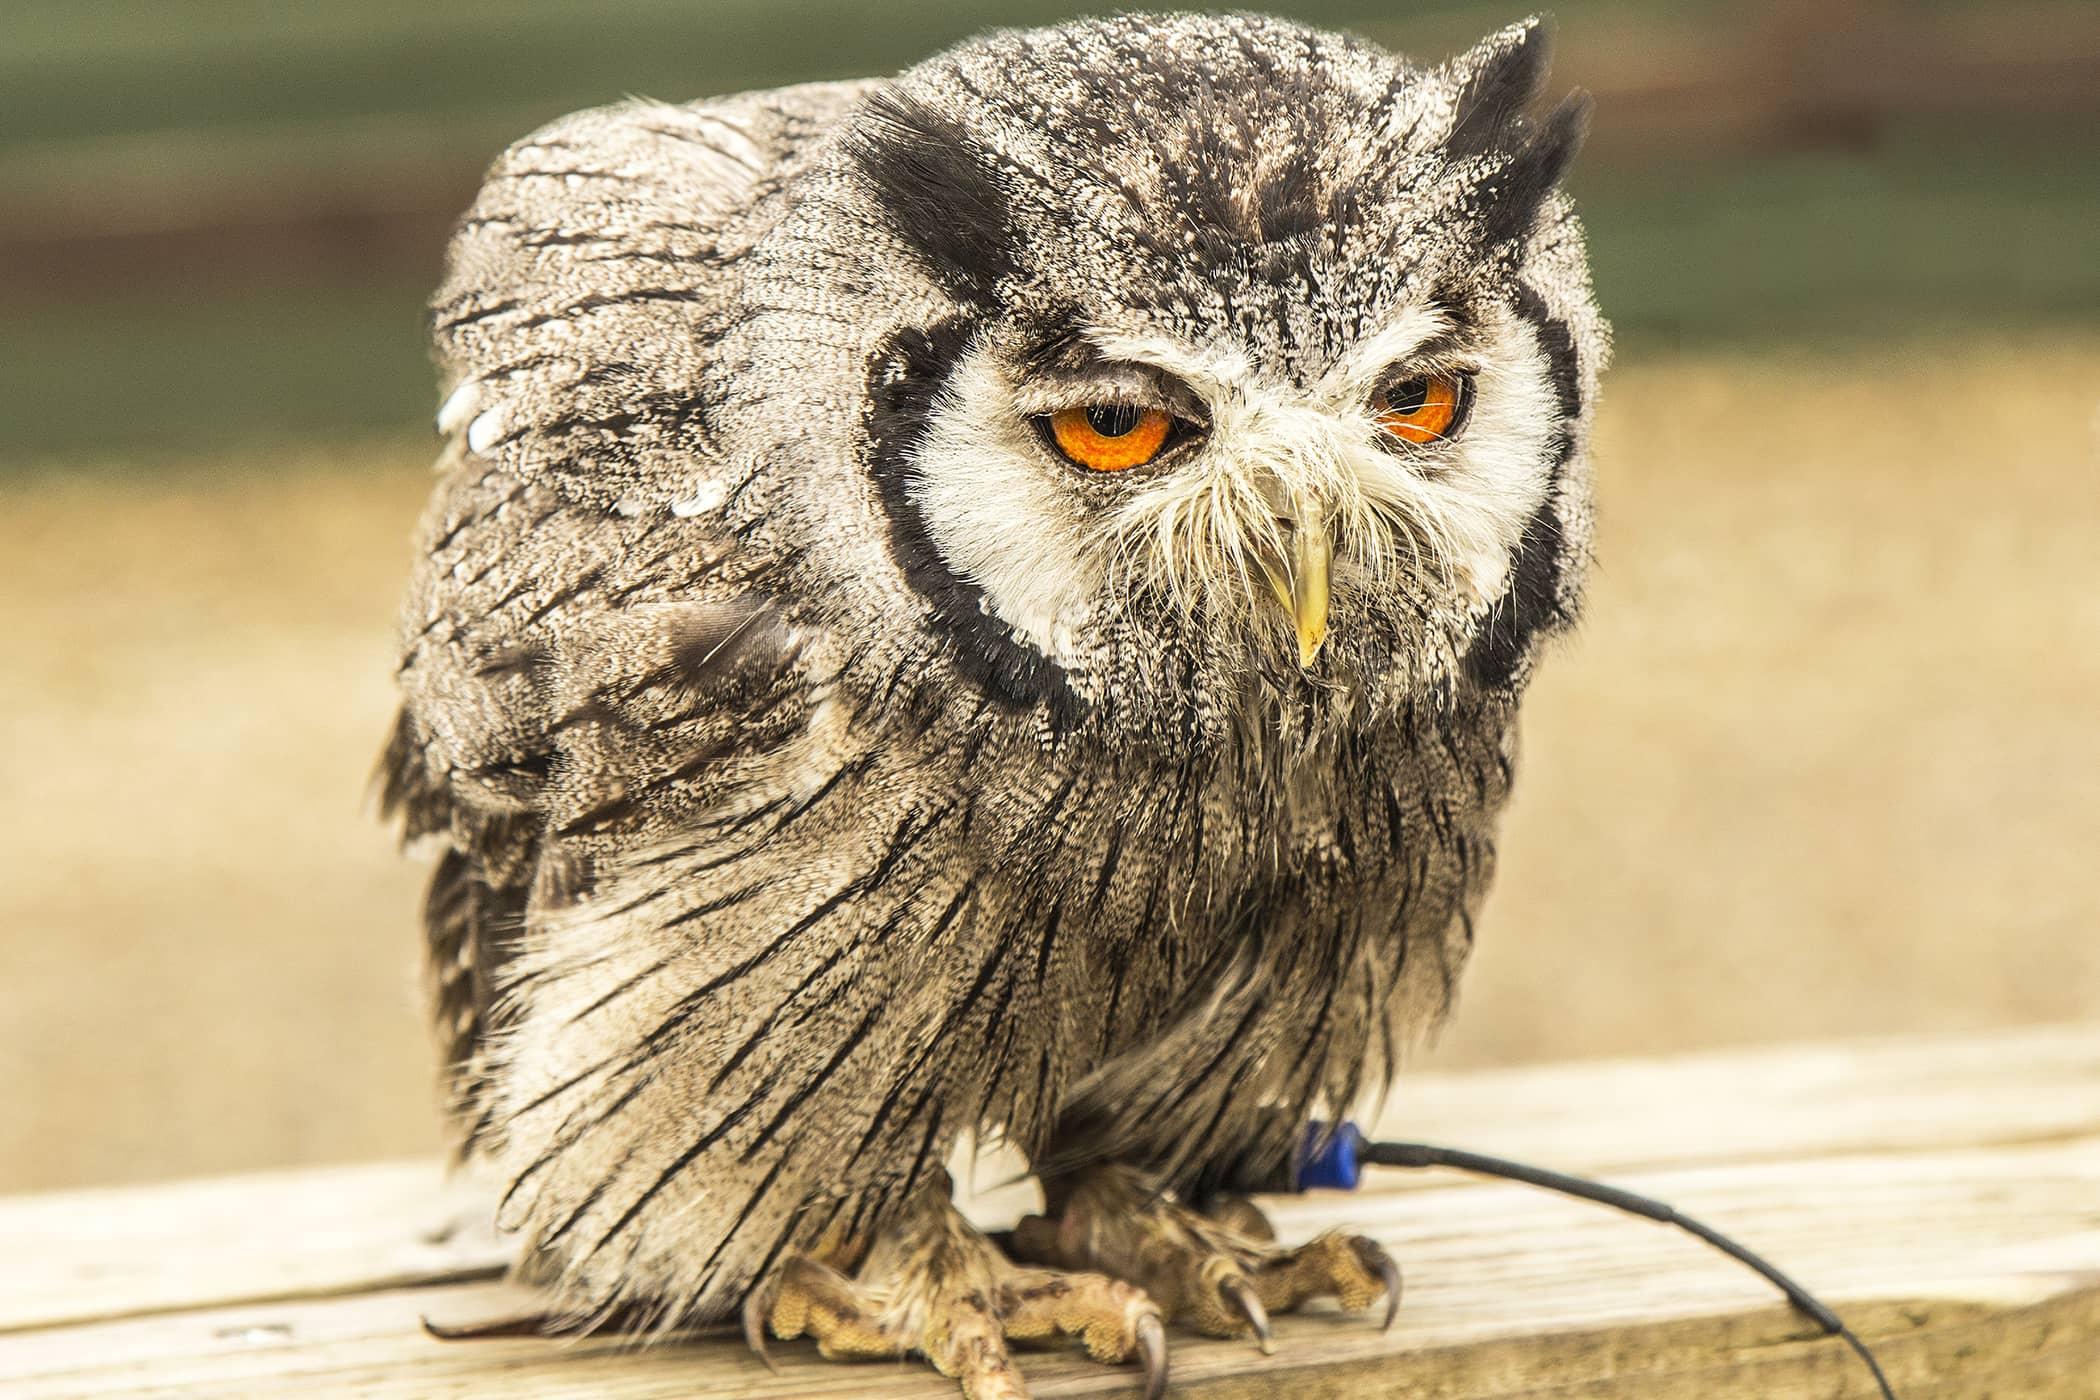 Prolapsed Cloaca in Birds